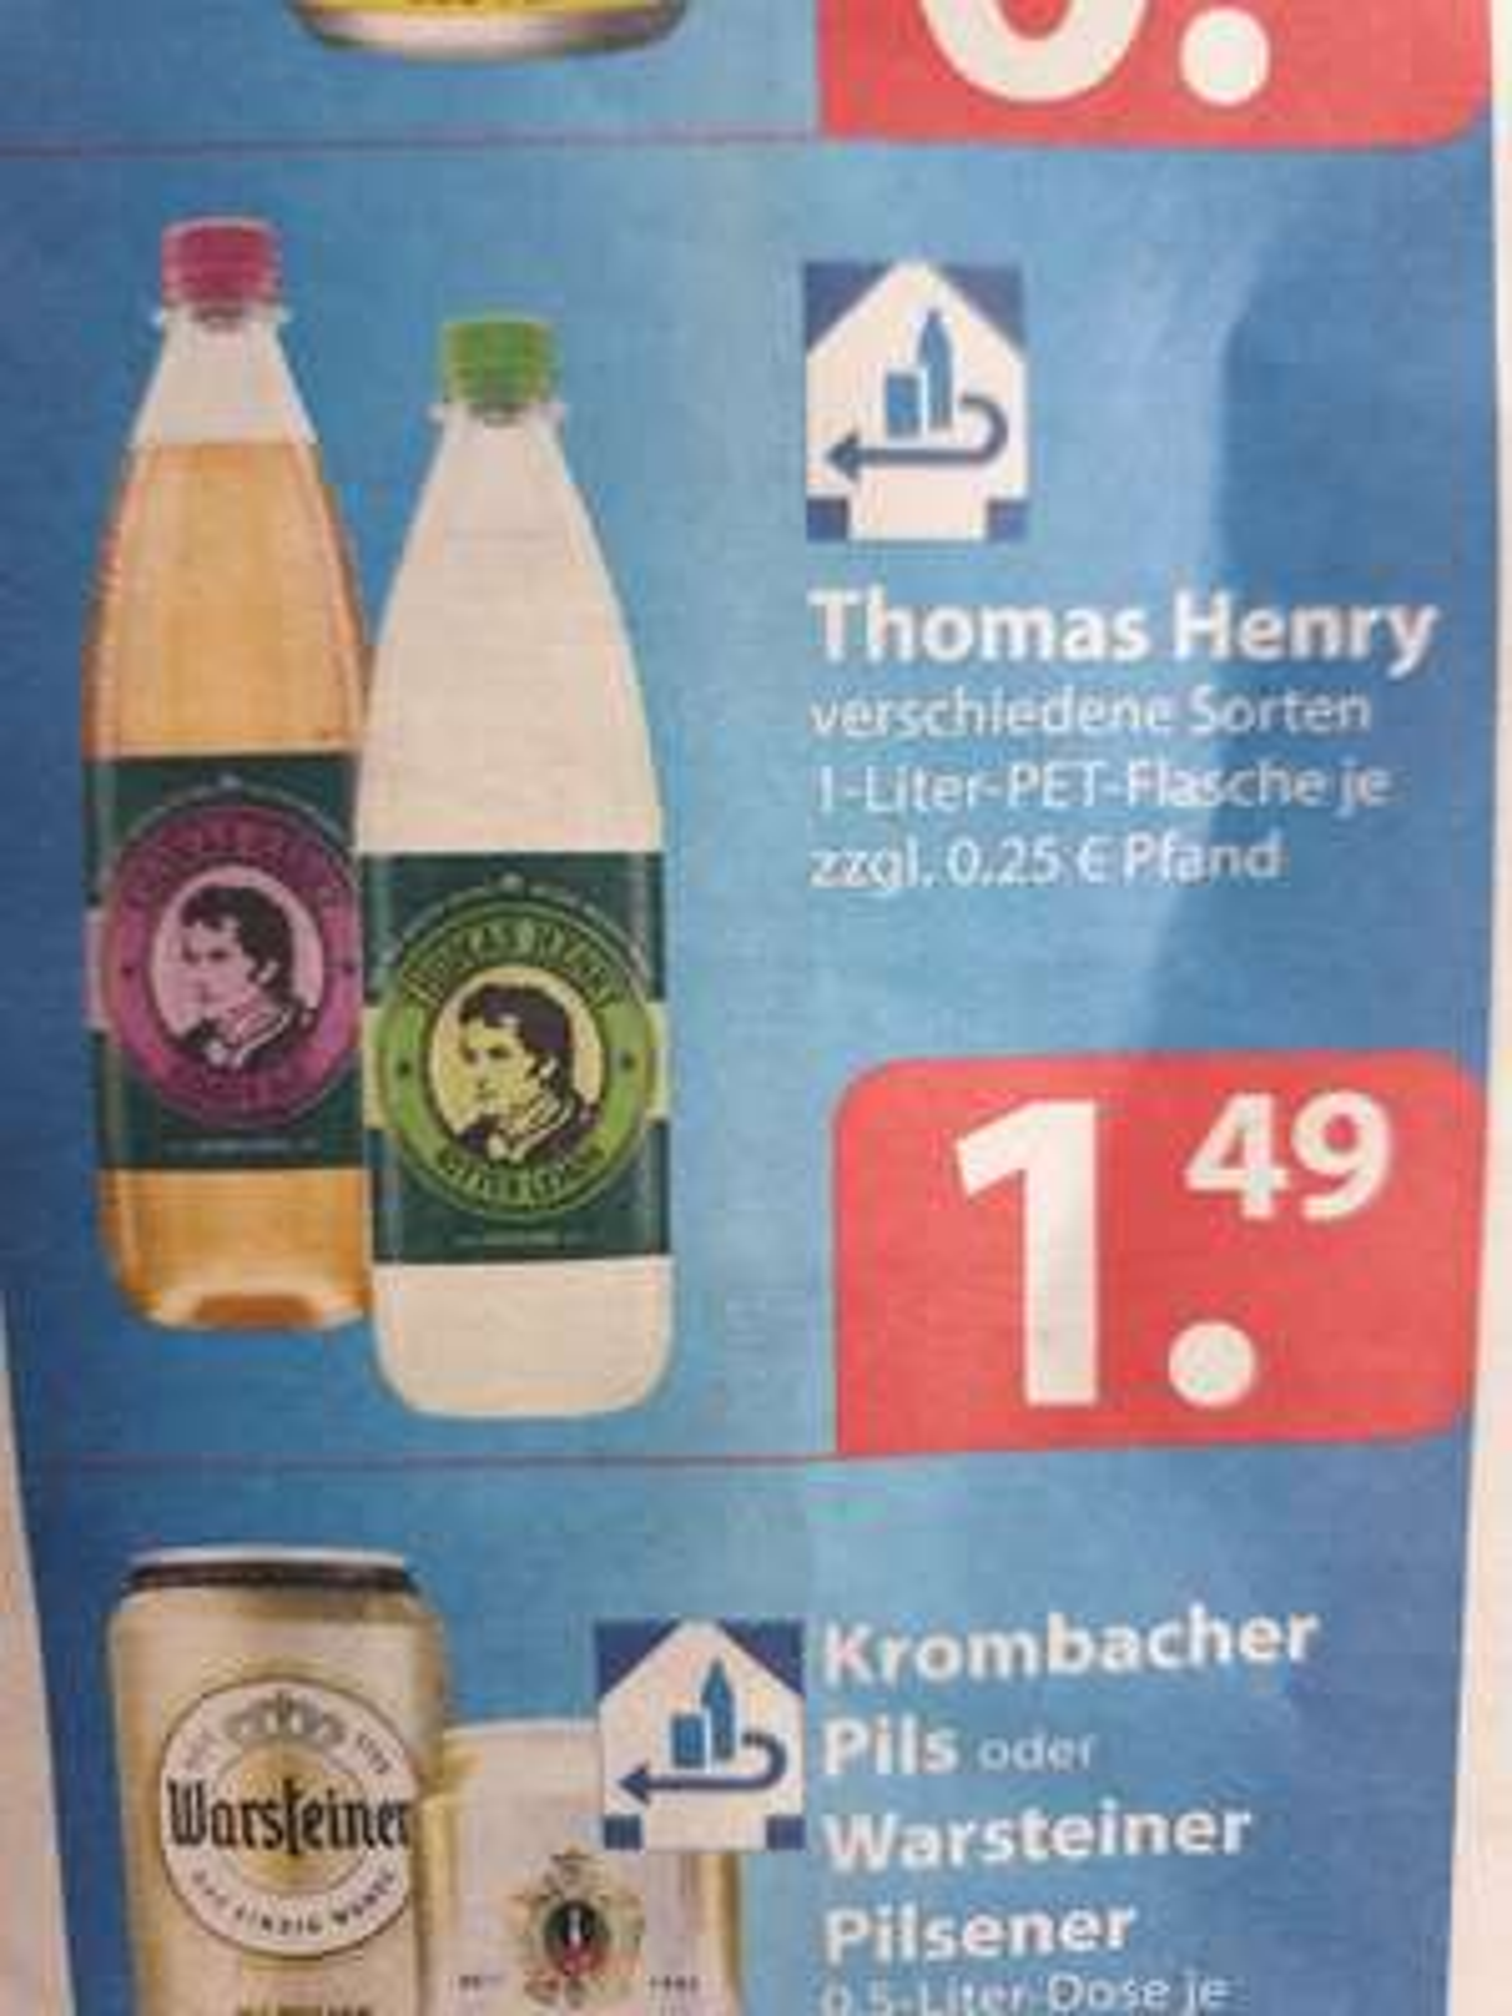 (Famila evtl. lokal) Thomas Henry Tonic-Water 1 Liter, versch. Sorten wie Ginger Ale für 1,49€